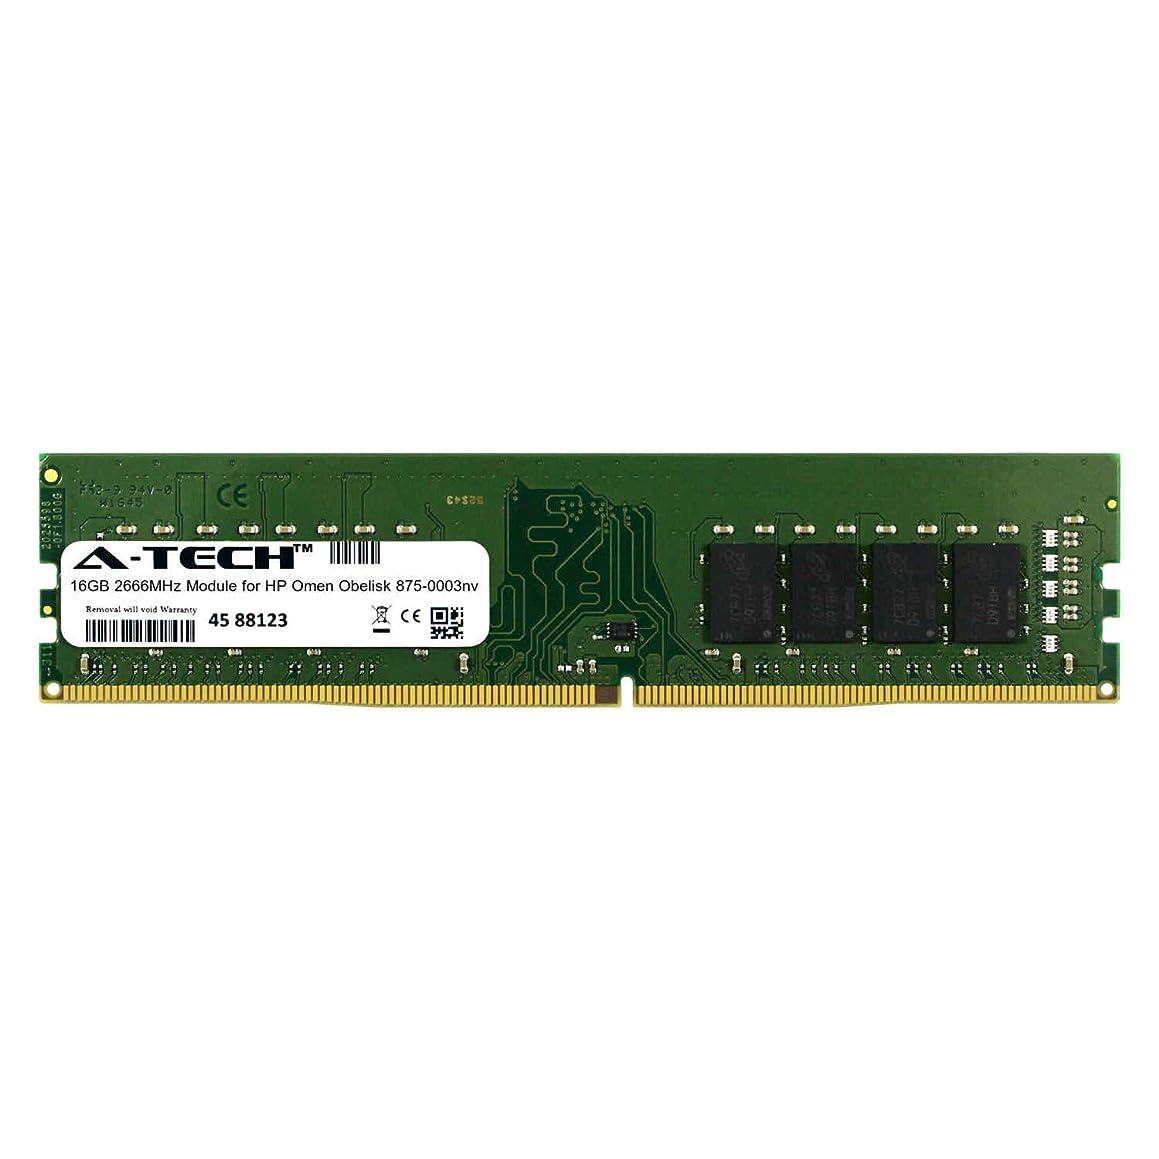 A-Tech 16GB Module for HP Omen Obelisk 875-0003nv Desktop & Workstation Motherboard Compatible DDR4 2666Mhz Memory Ram (ATMS282895A25823X1)